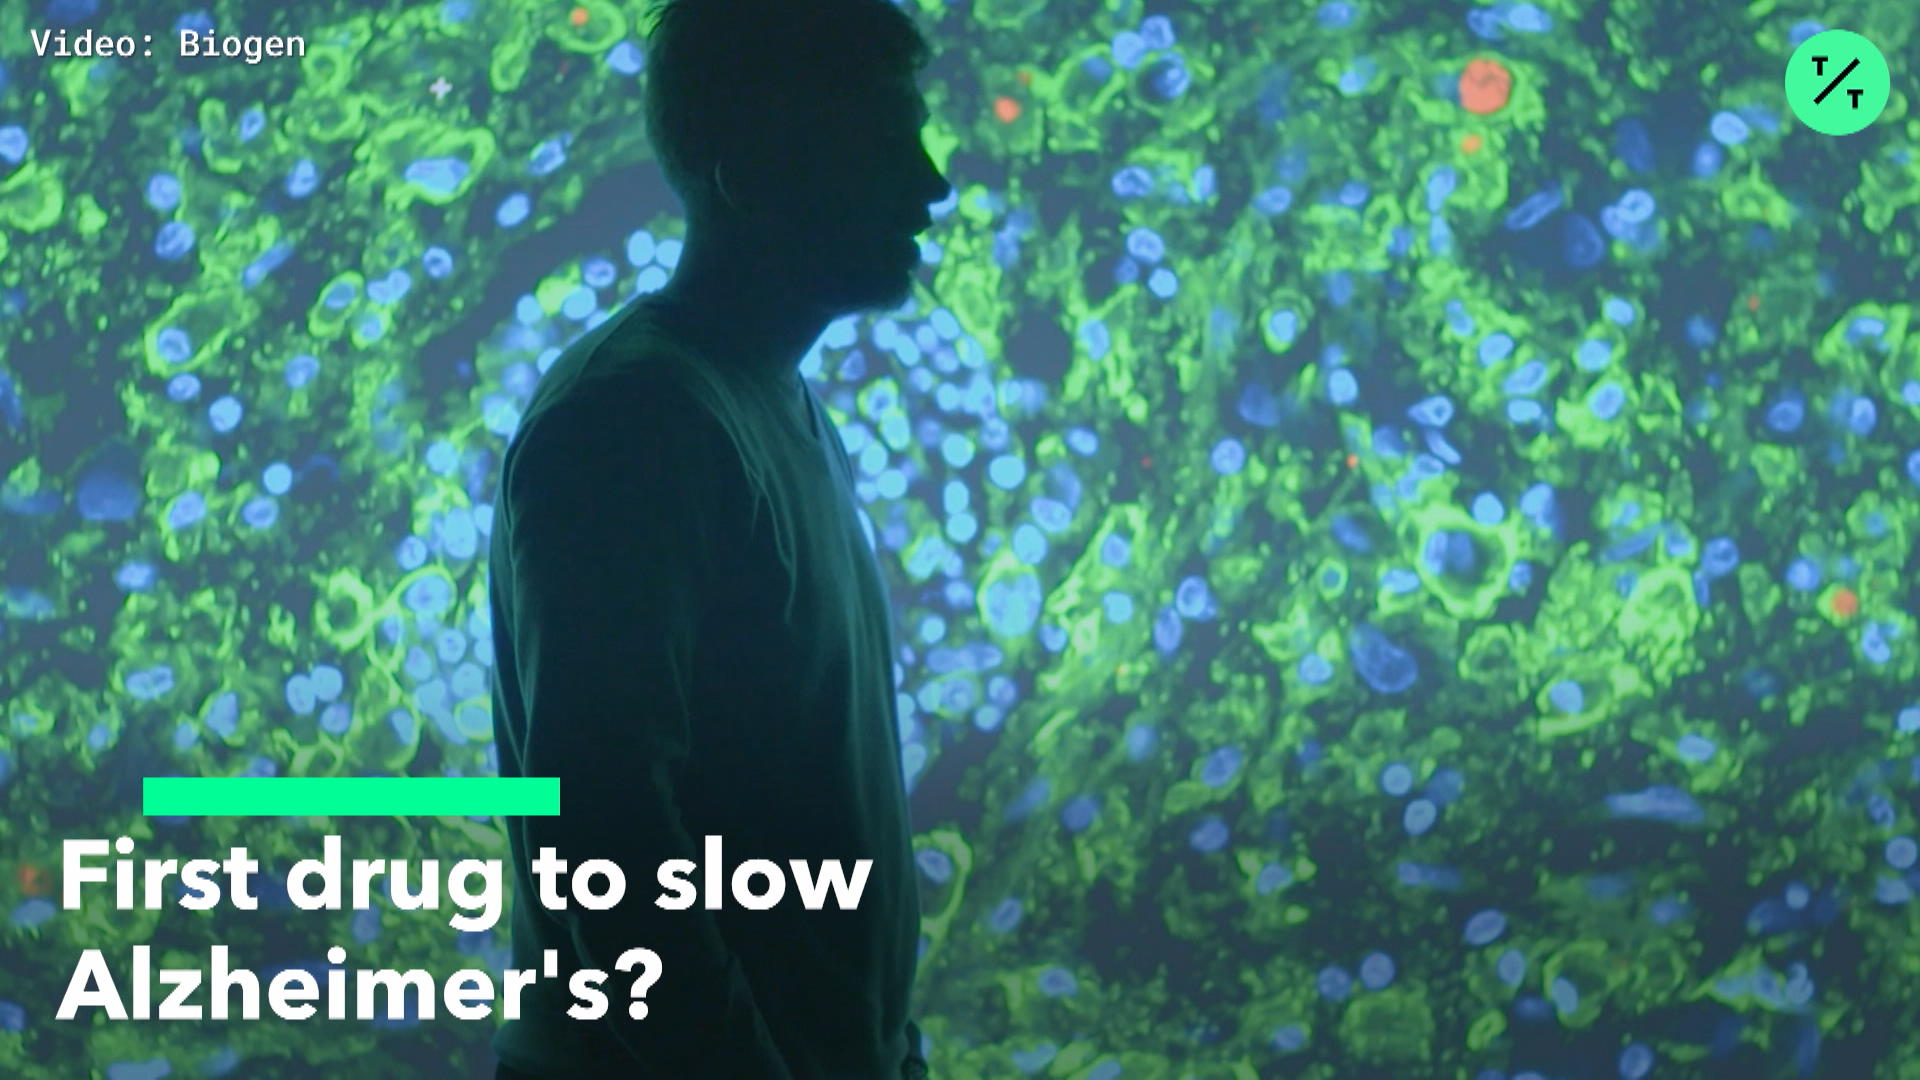 First Drug To Slow Alzheimer's?